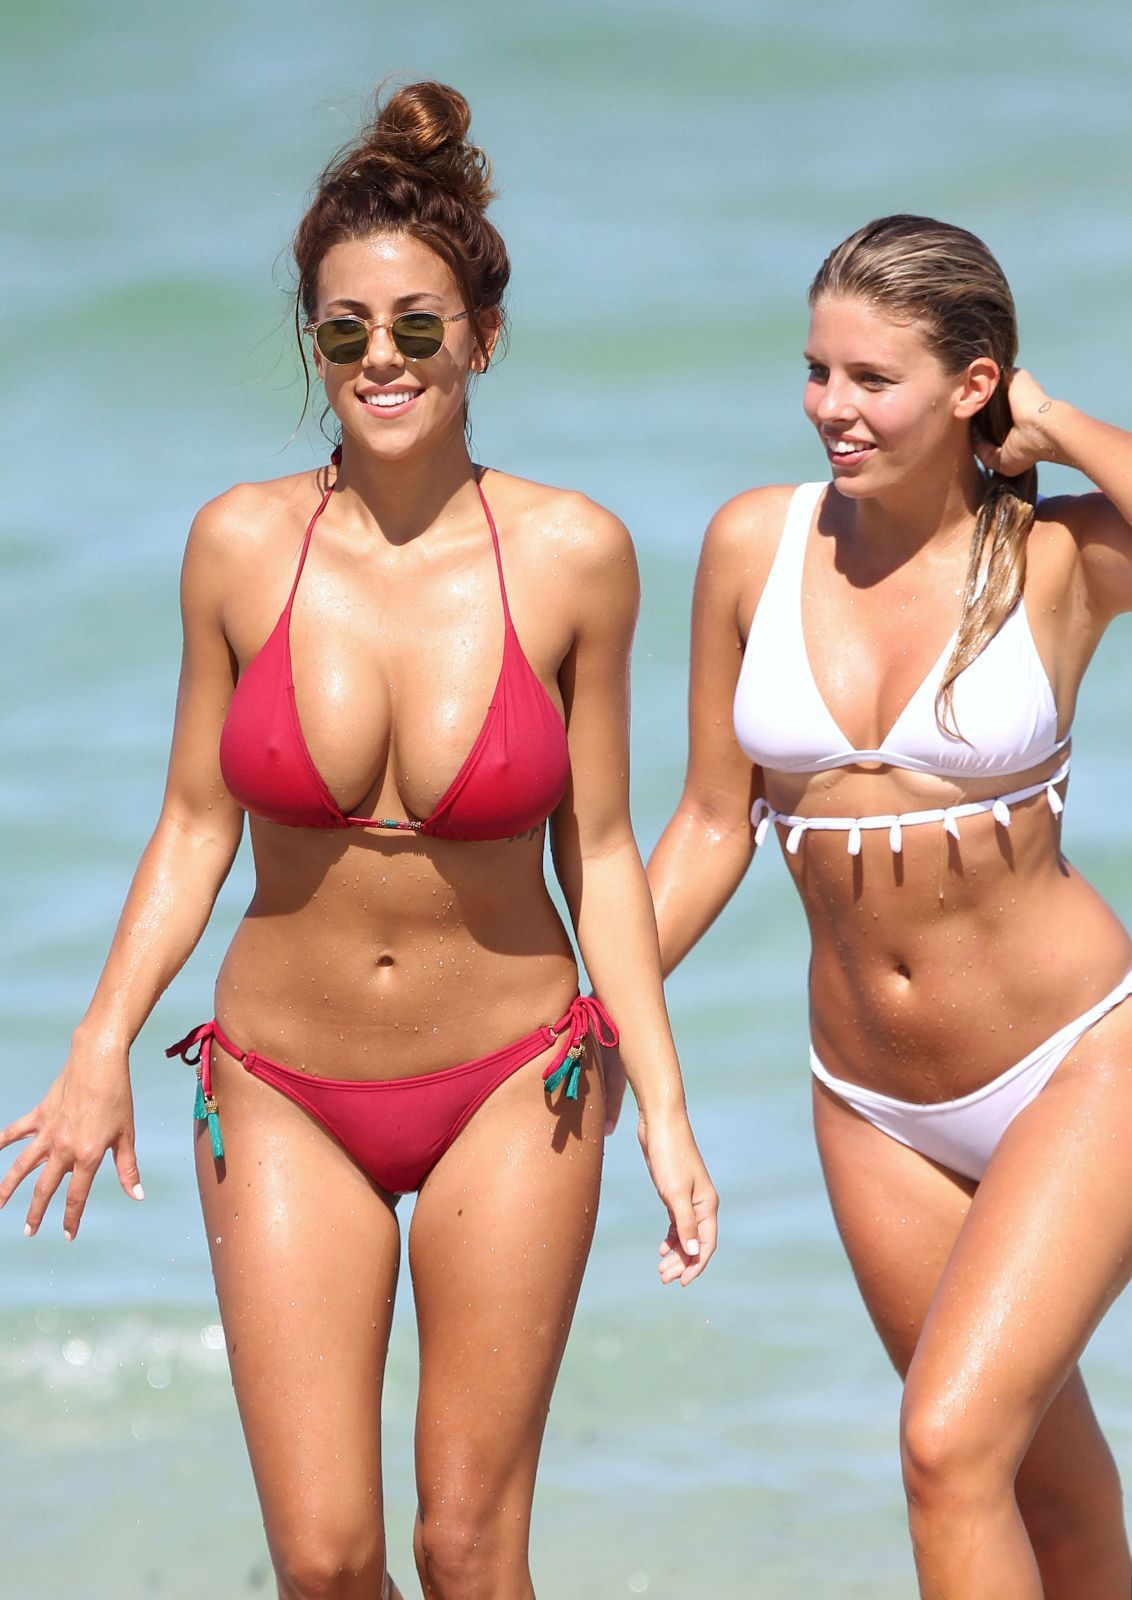 Natasha Oakley & Devin Brugman Bikini Fun In Miami